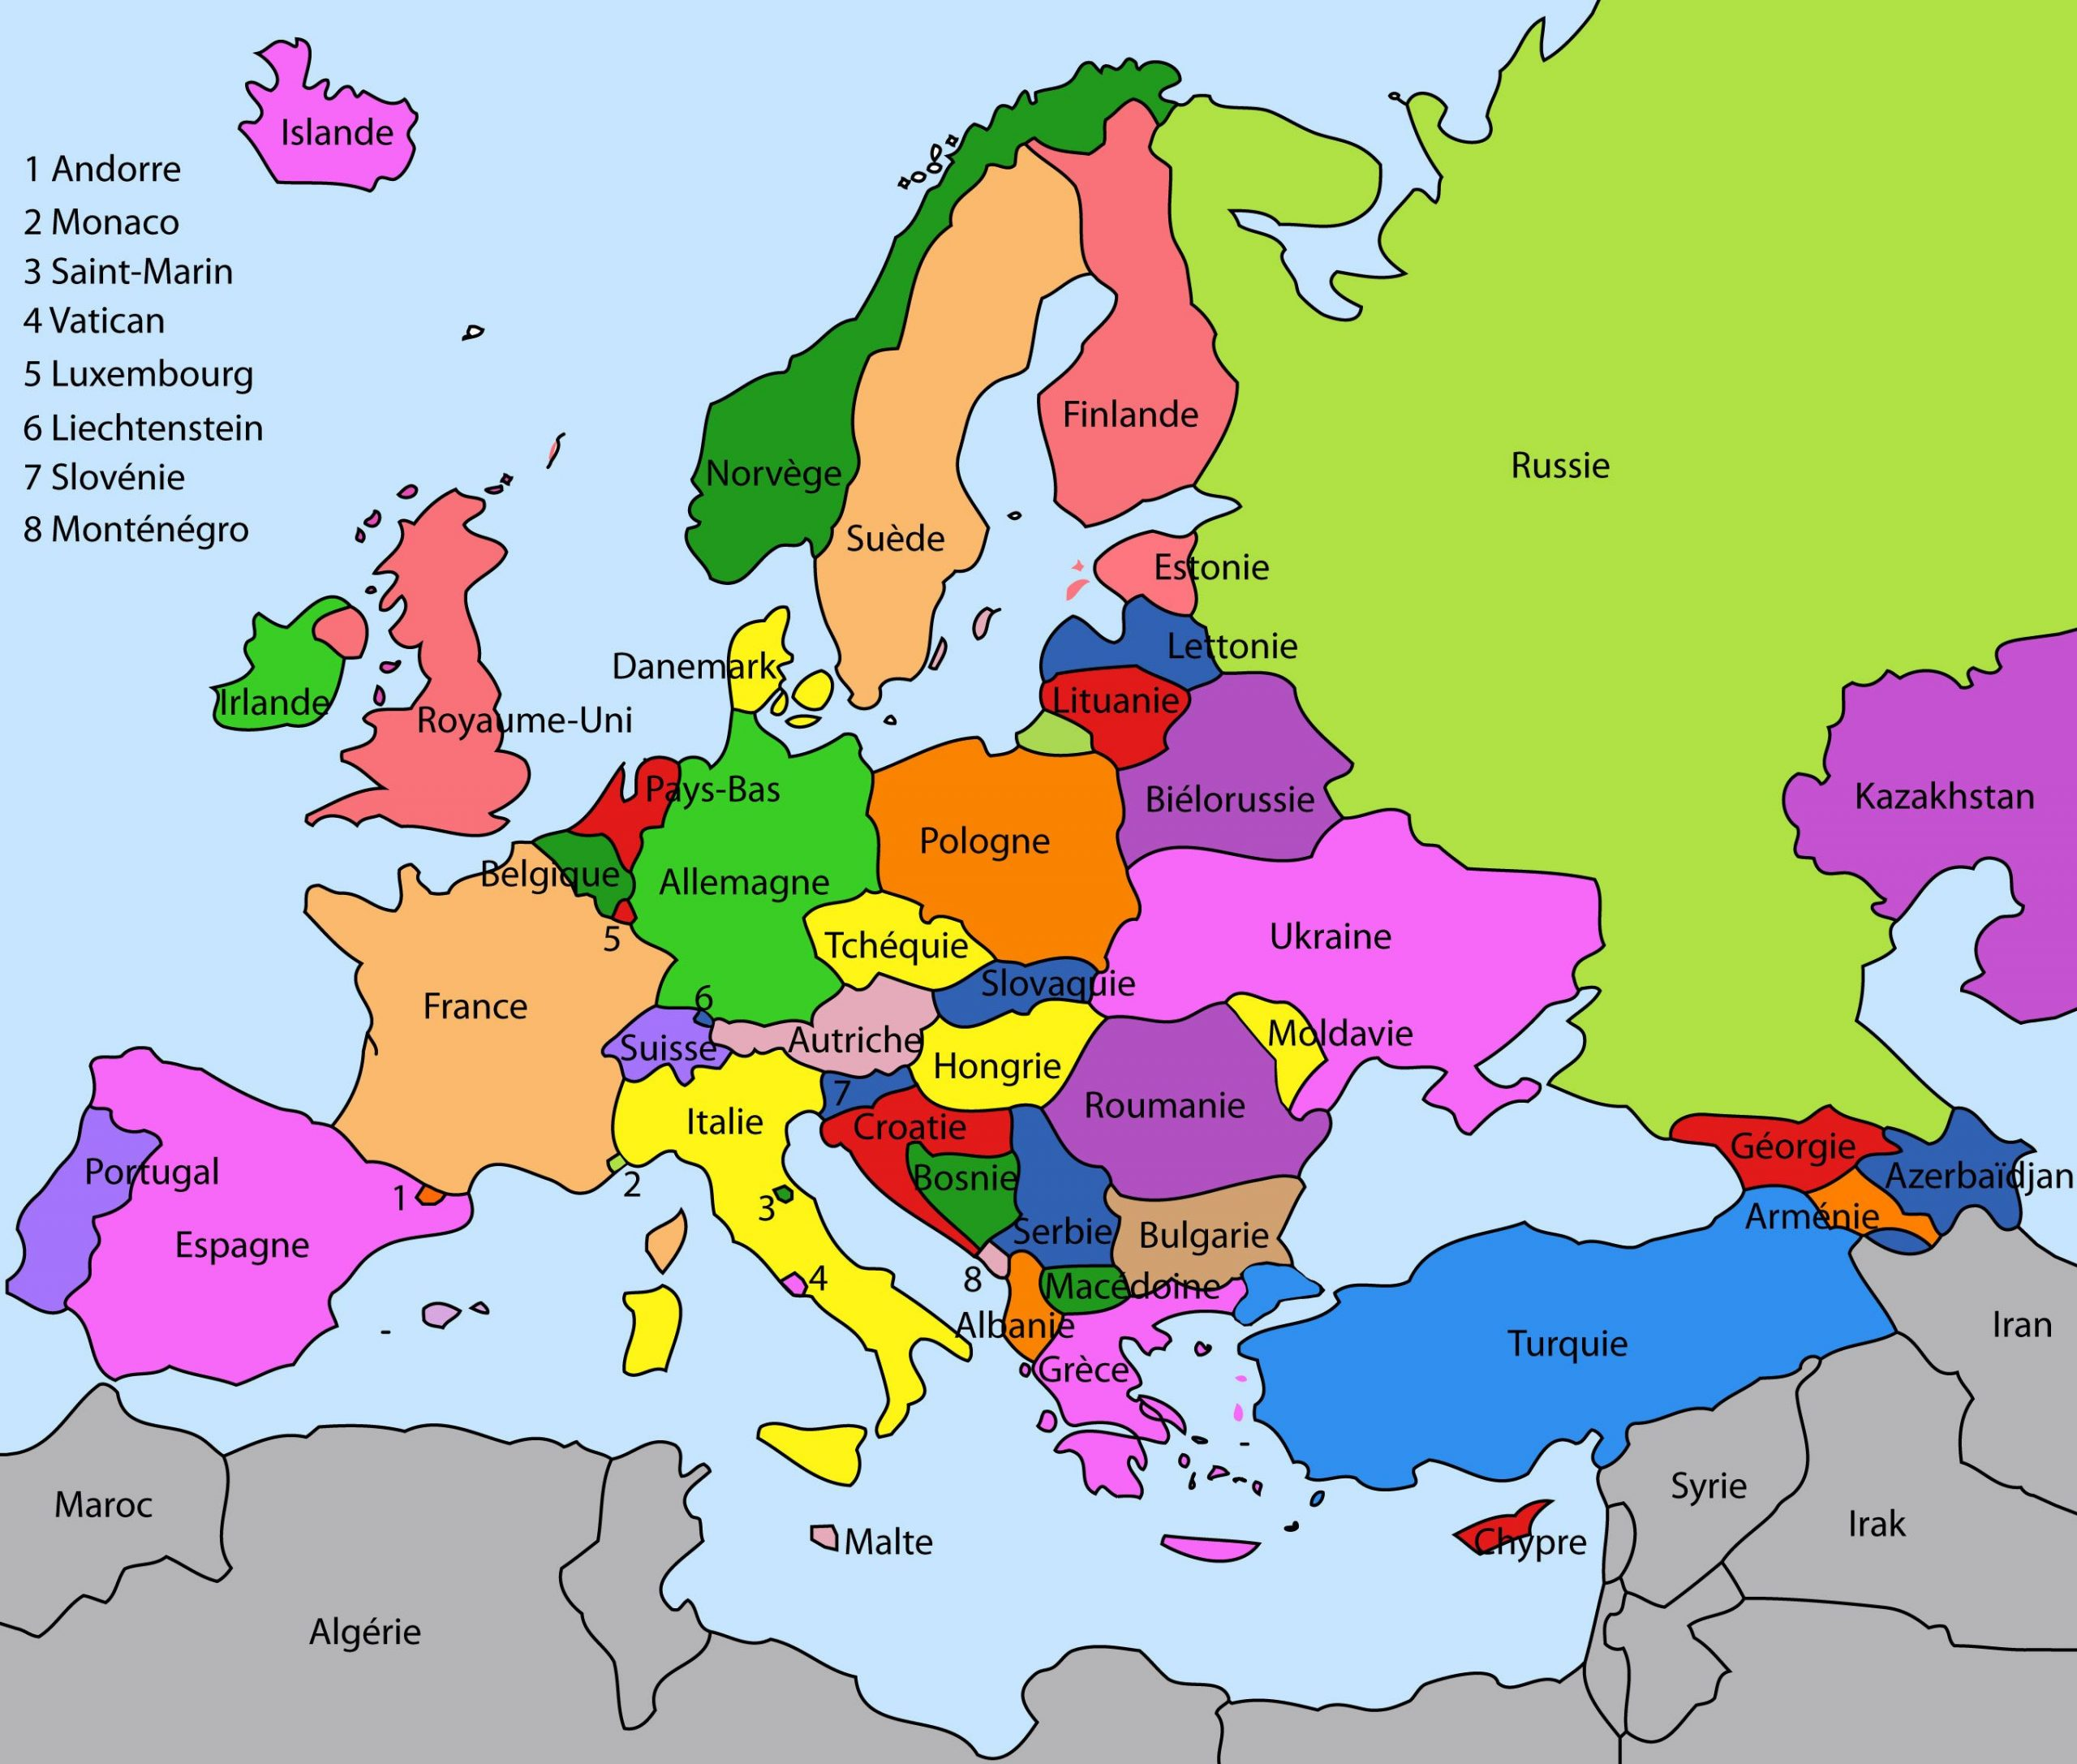 Carte Des Pays De L'europe | Carte Europe, Carte Europe Pays concernant Carte Europe Vierge Cm1